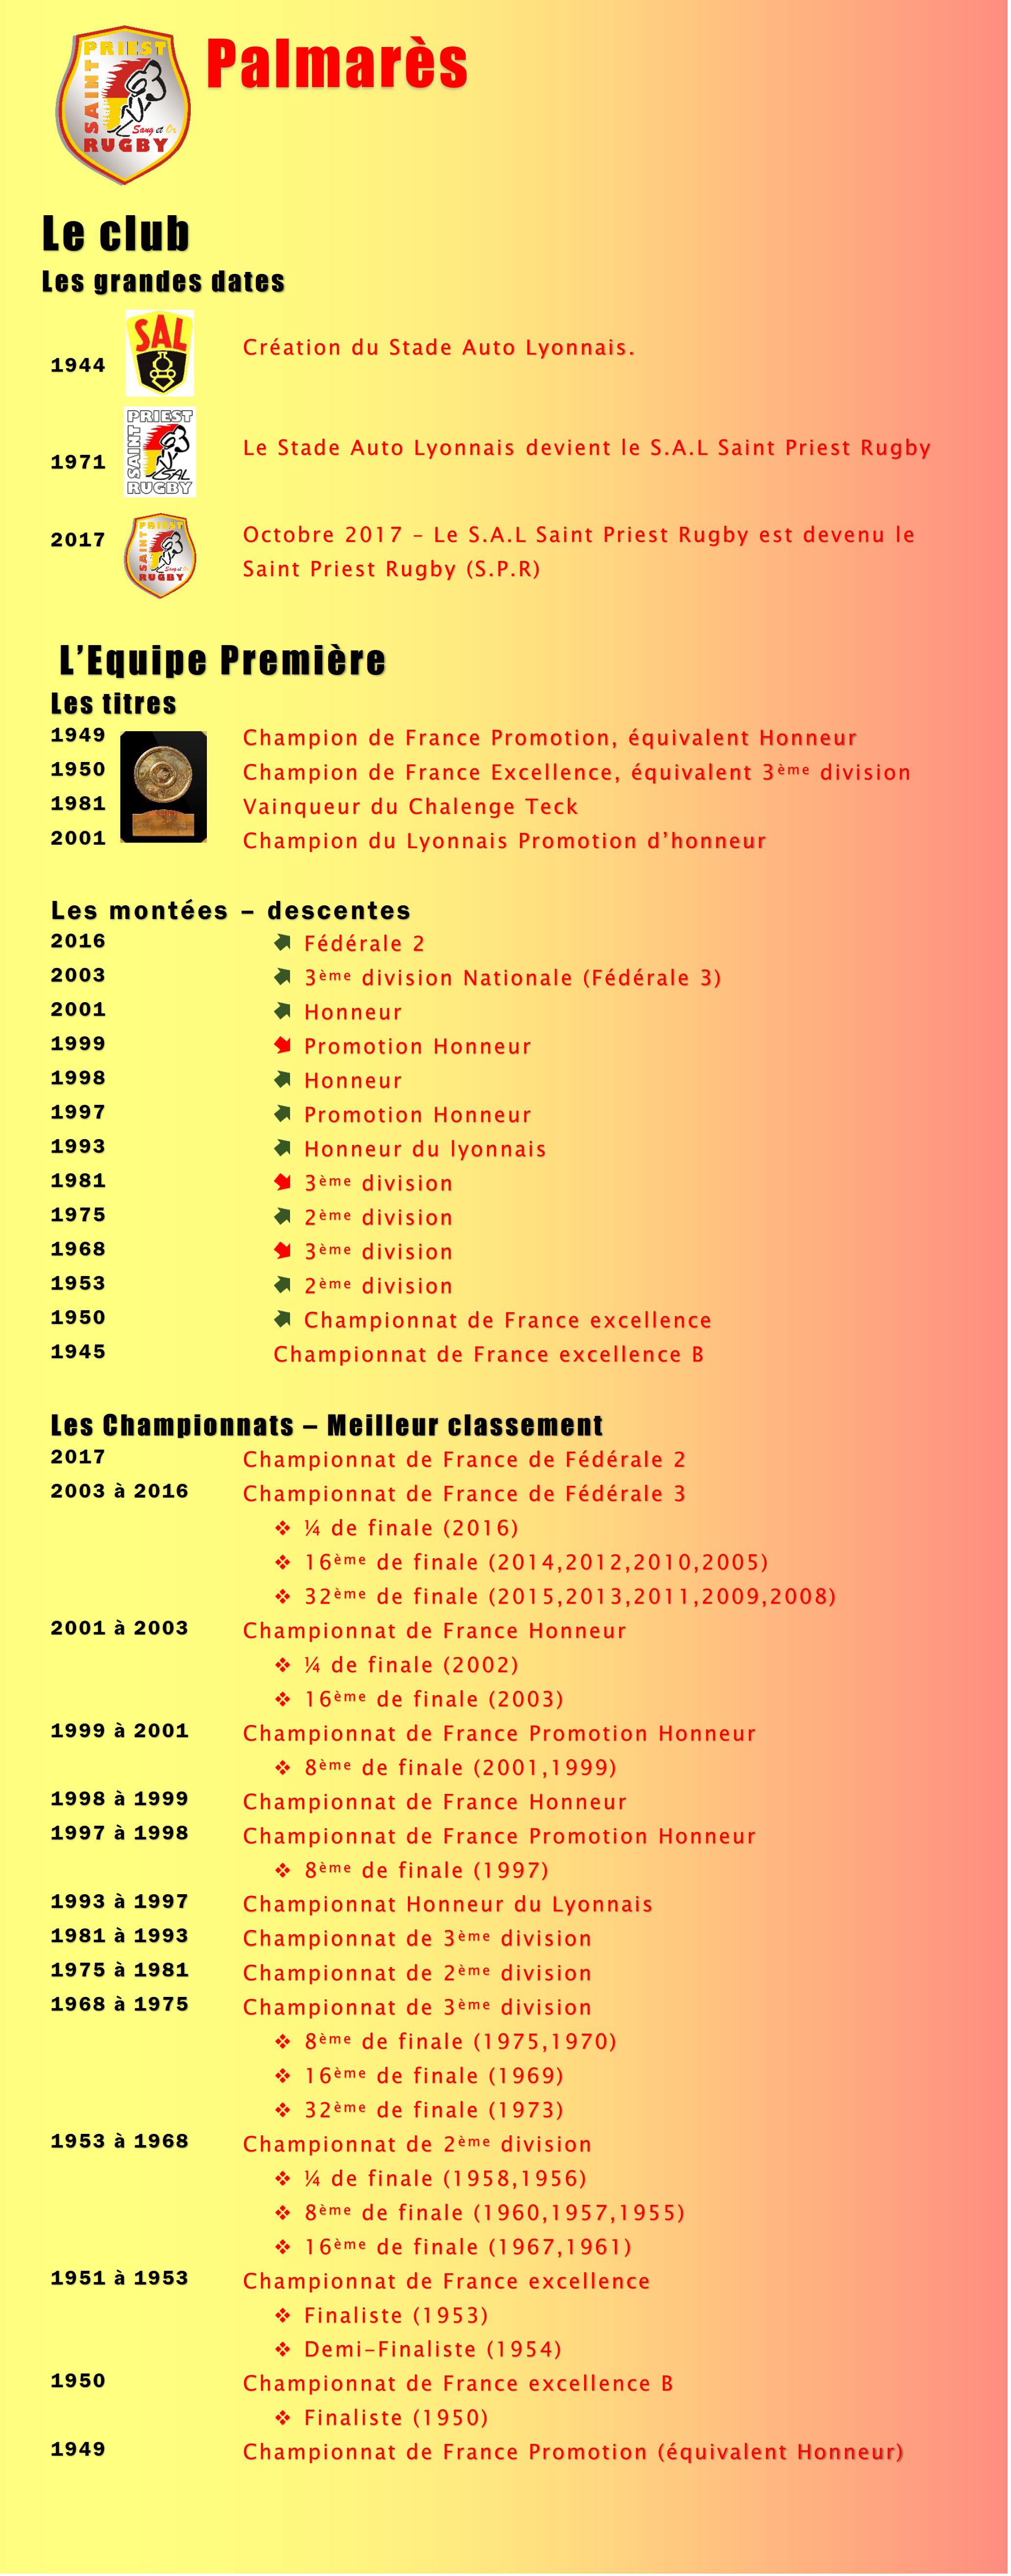 SPR - Le Palmares.png